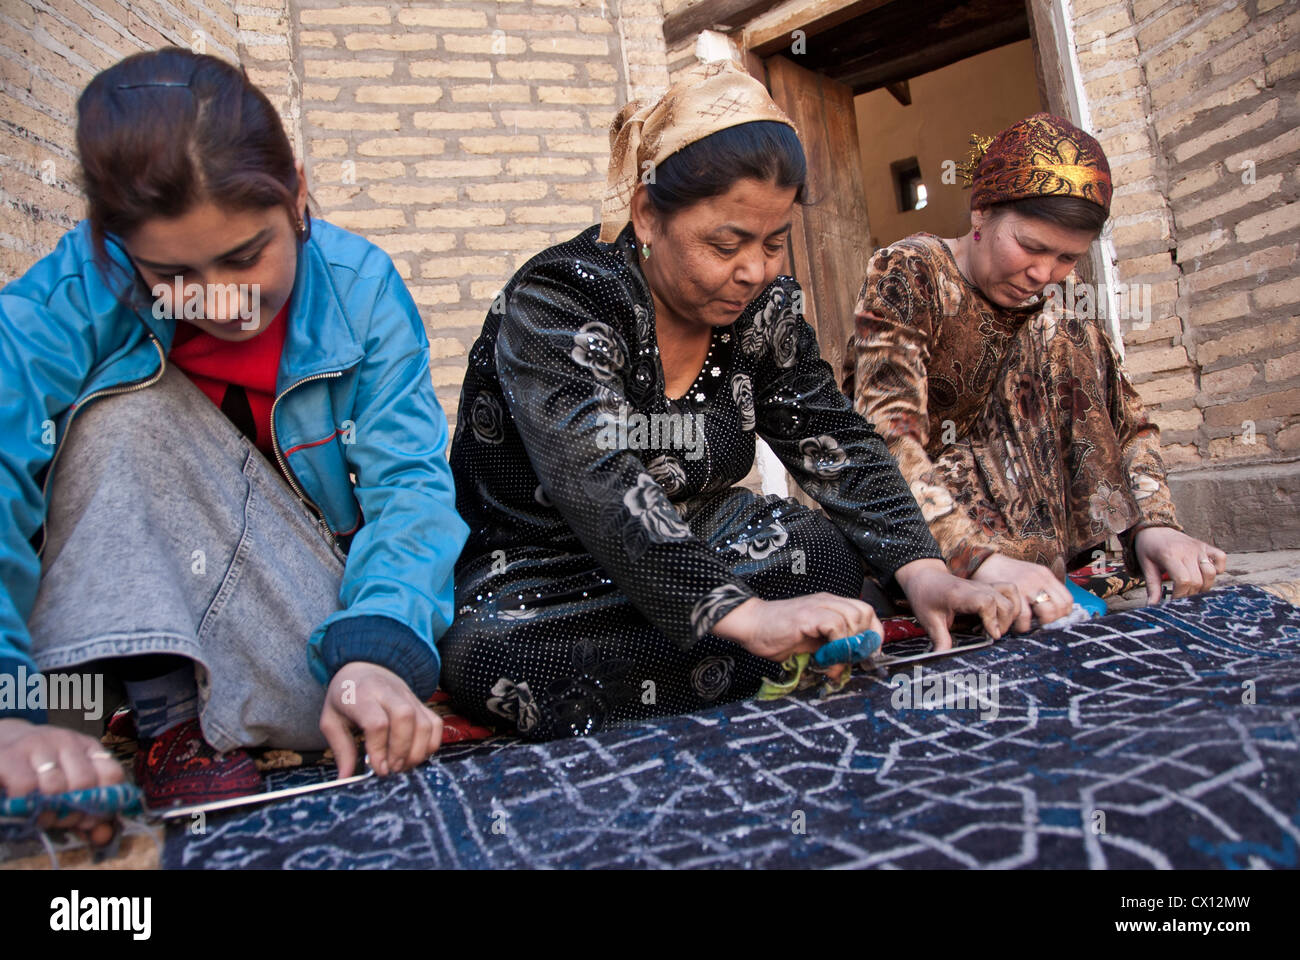 Women weaving traditional carpet, Khiva, Uzbekistan - Stock Image